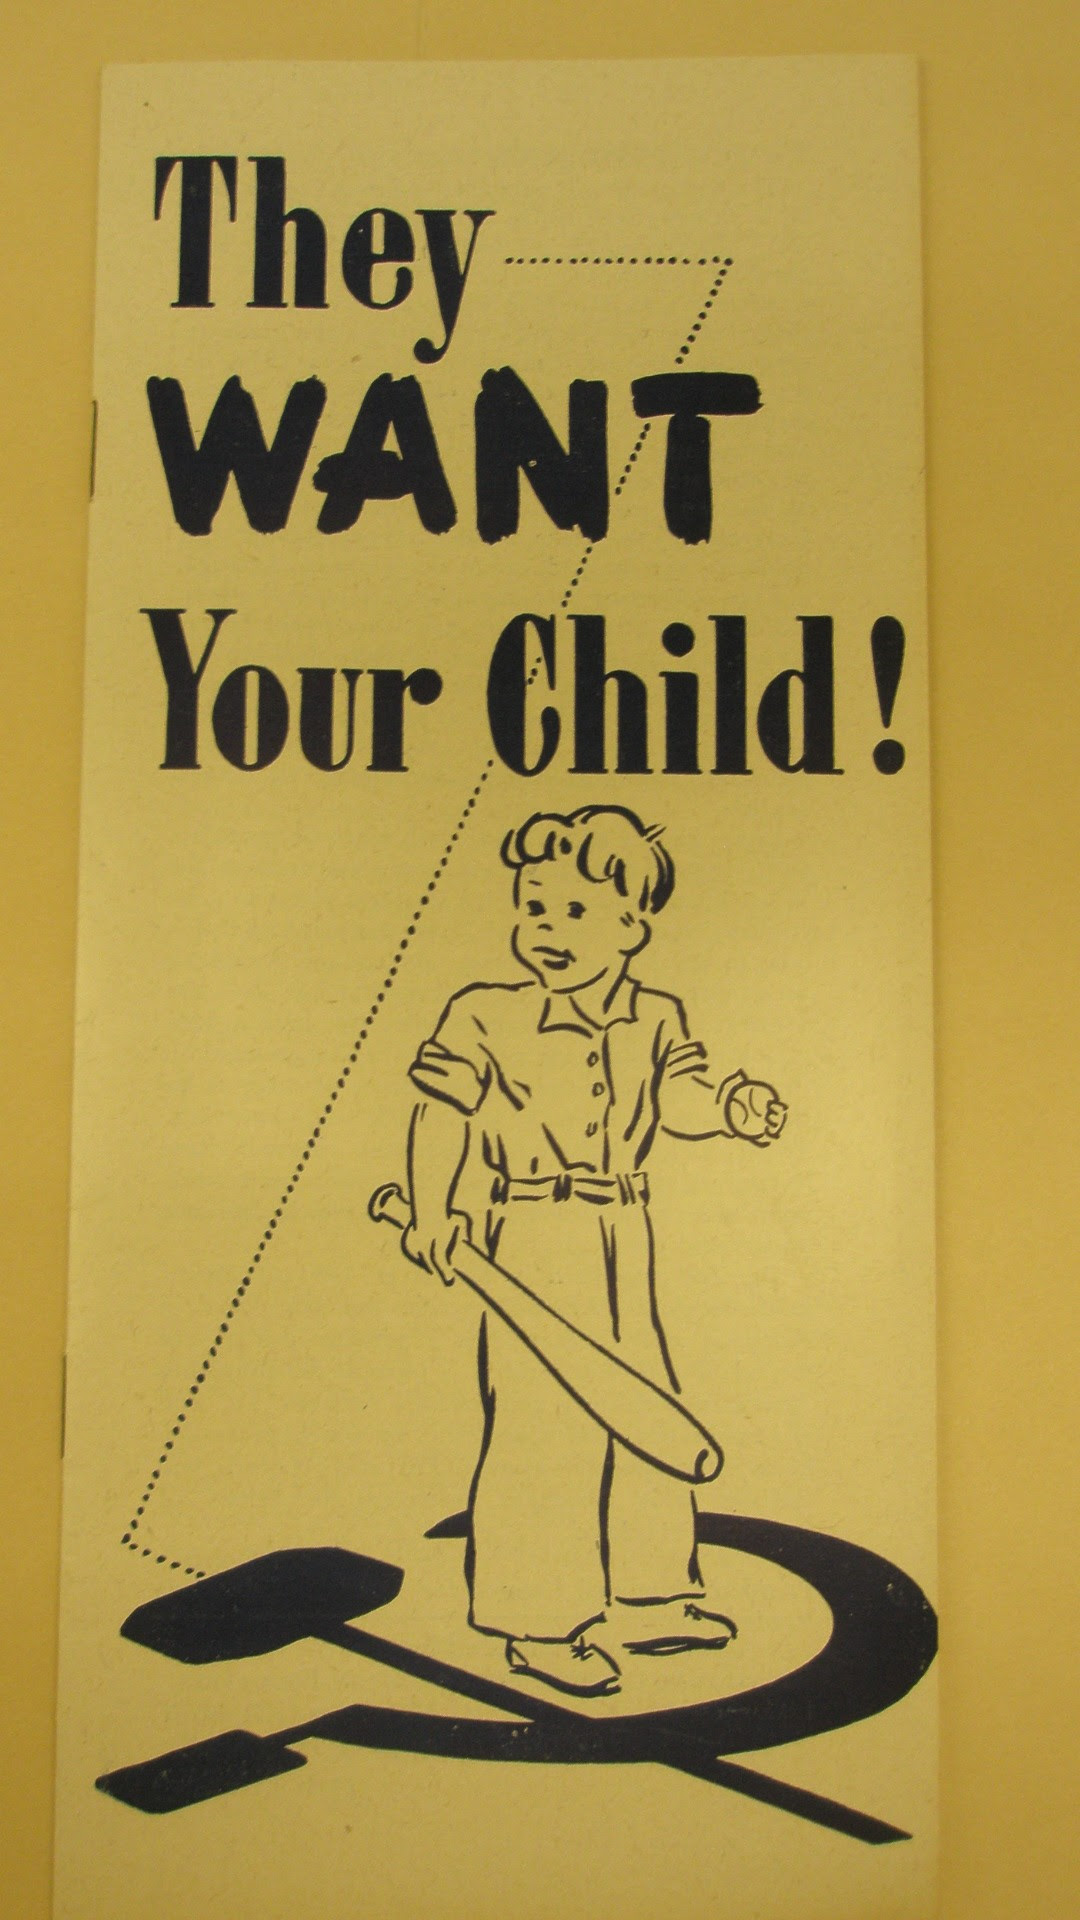 http://iloveyoubutyouregoingtohell.files.wordpress.com/2013/01/zoll-they-want-your-child-box-33-folder-8-2-e1357913530755.jpg